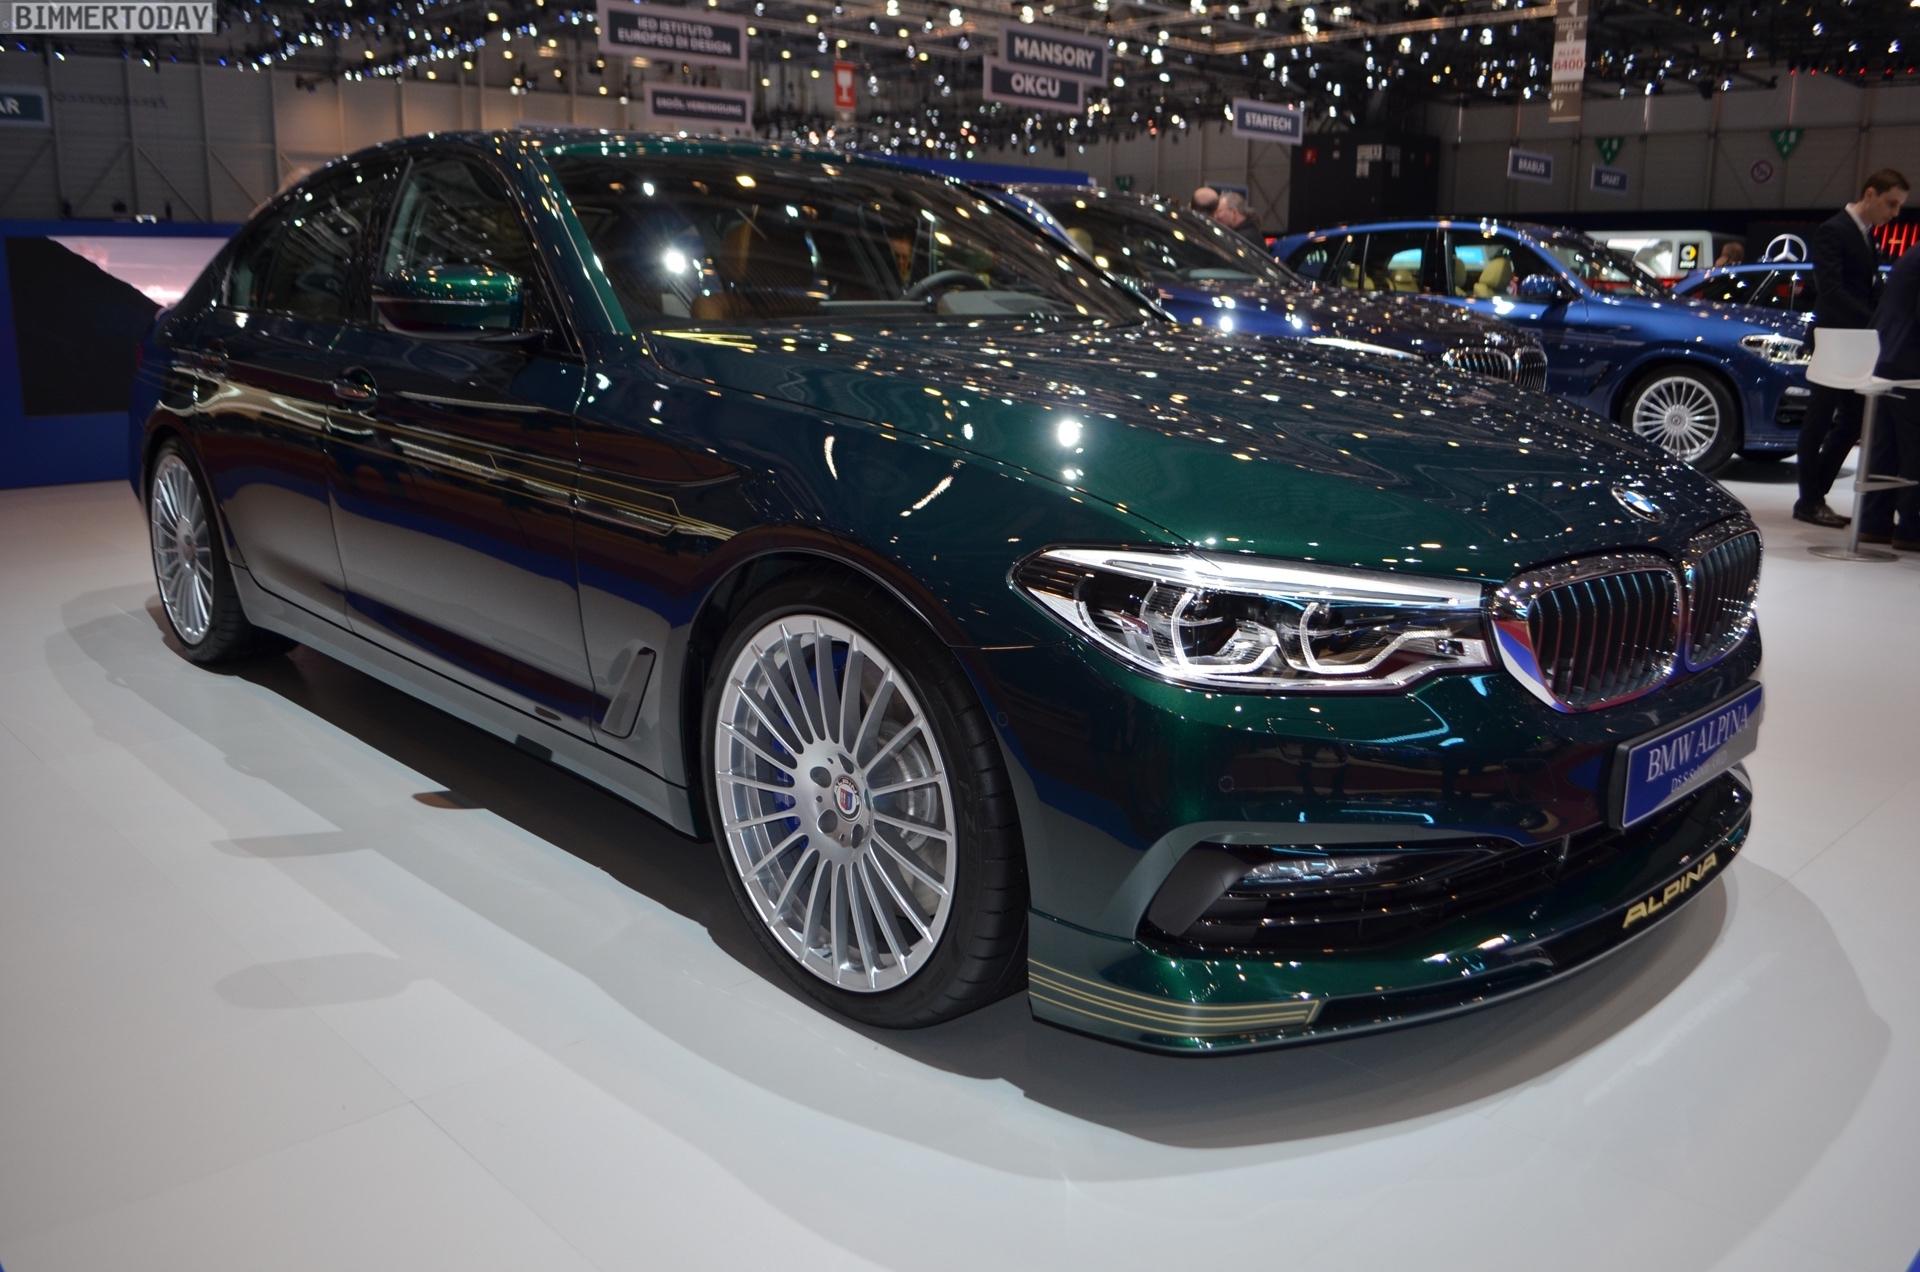 Genf 2018 Alpina D5 S BMW 5er G30 Live 01